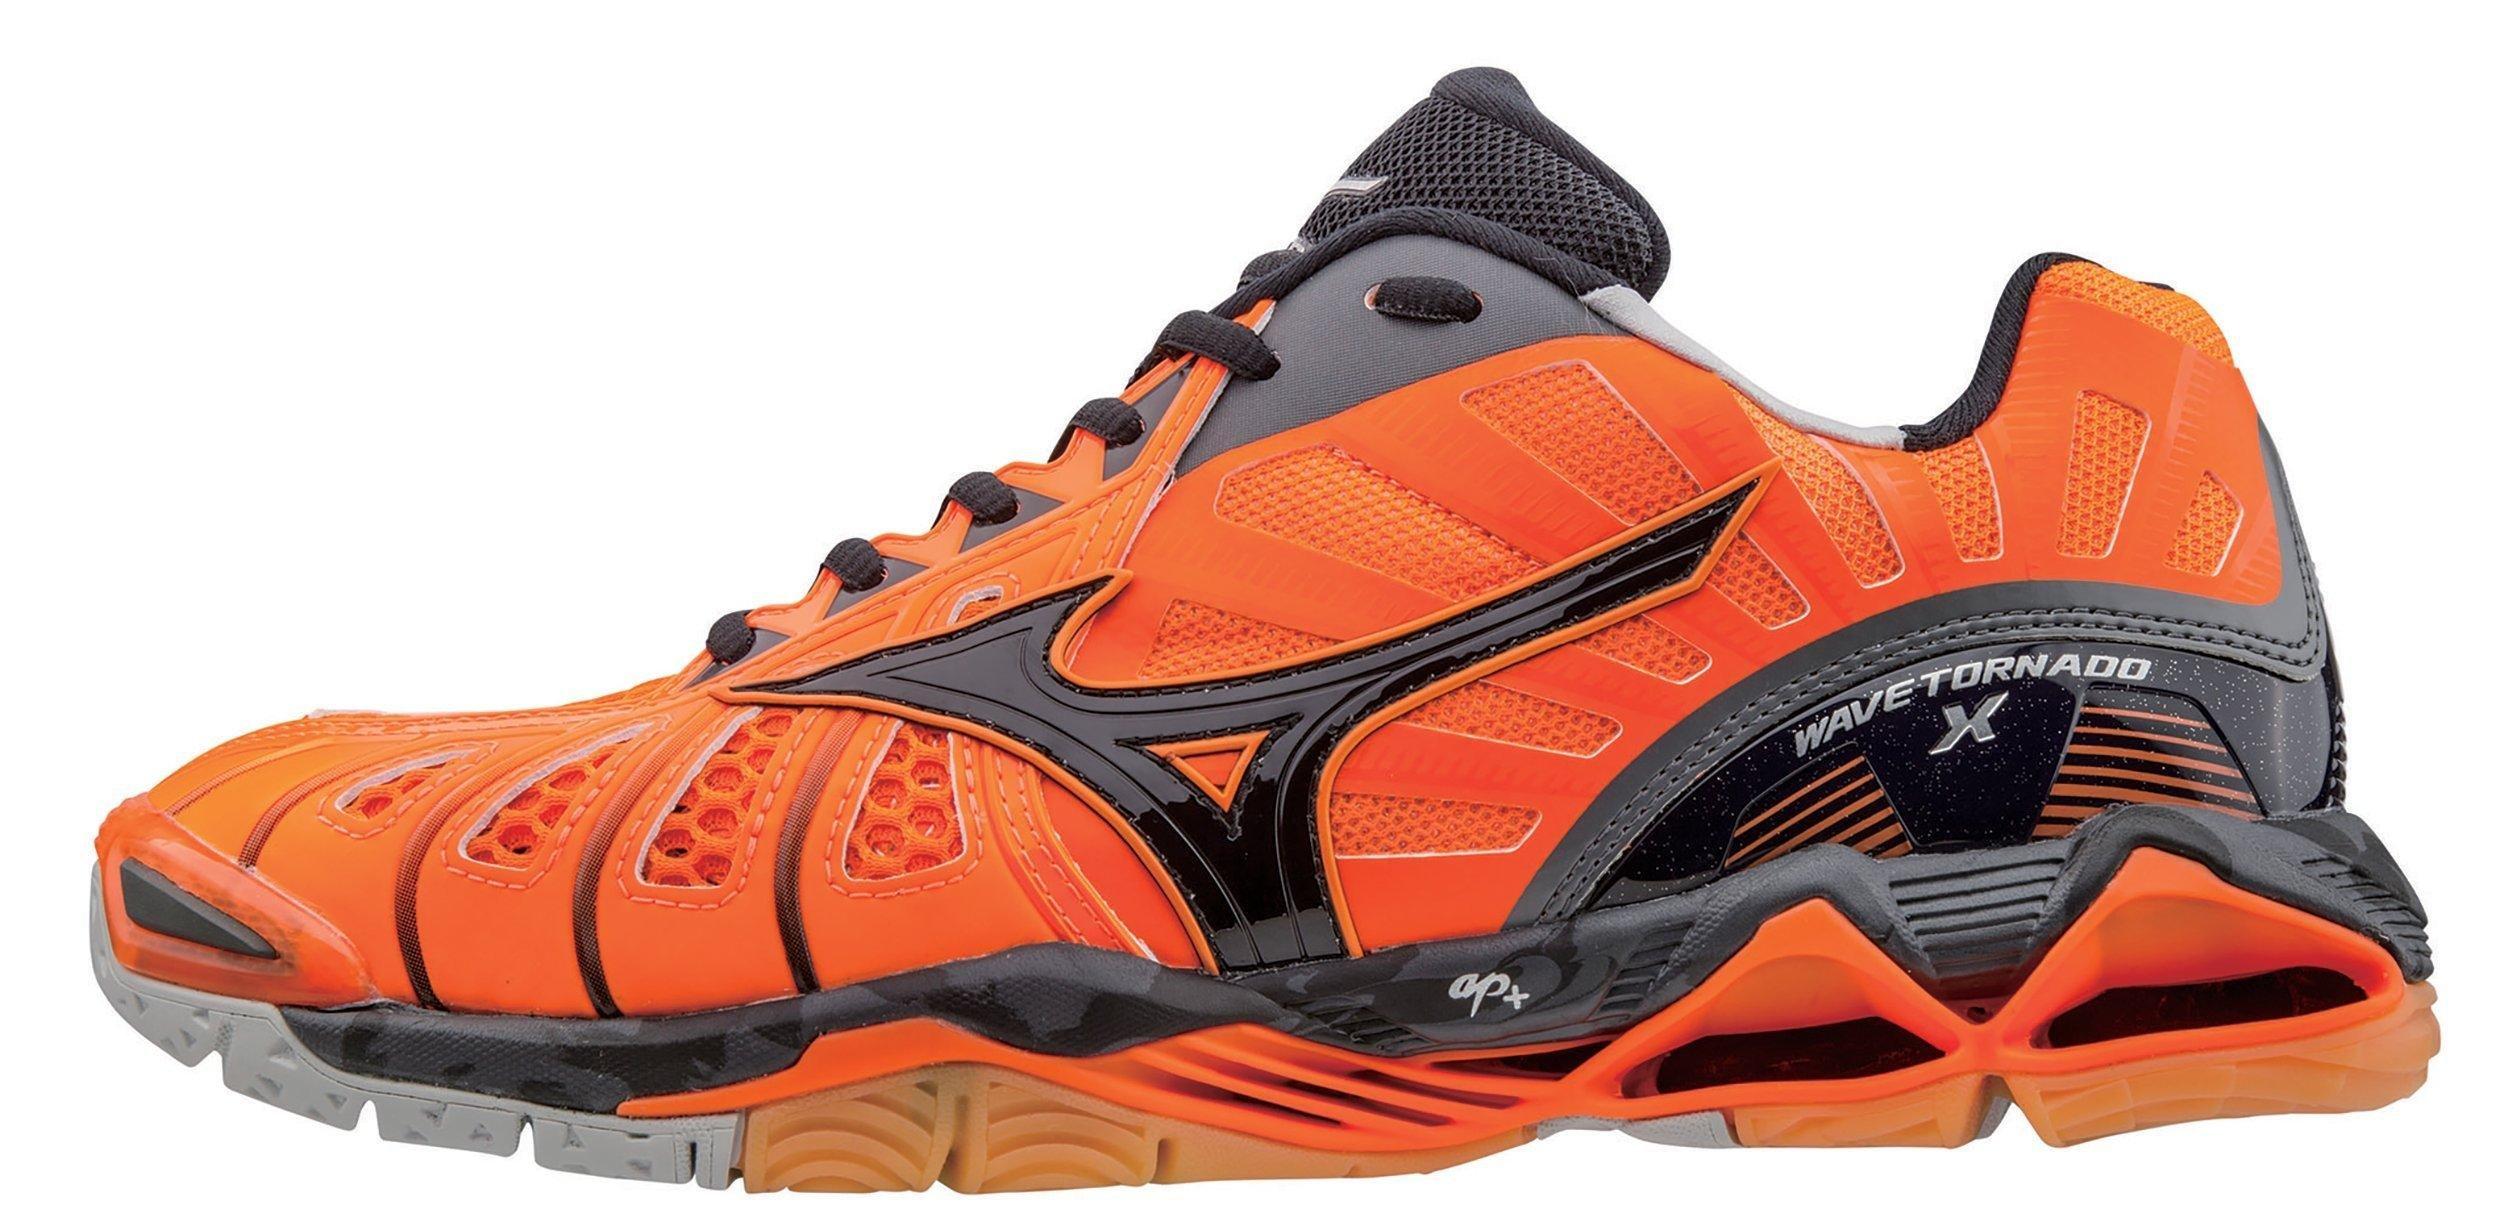 Mizuno Men's Wave Tornado X Volleyball Shoe, Orange/Black, 12.5 D US